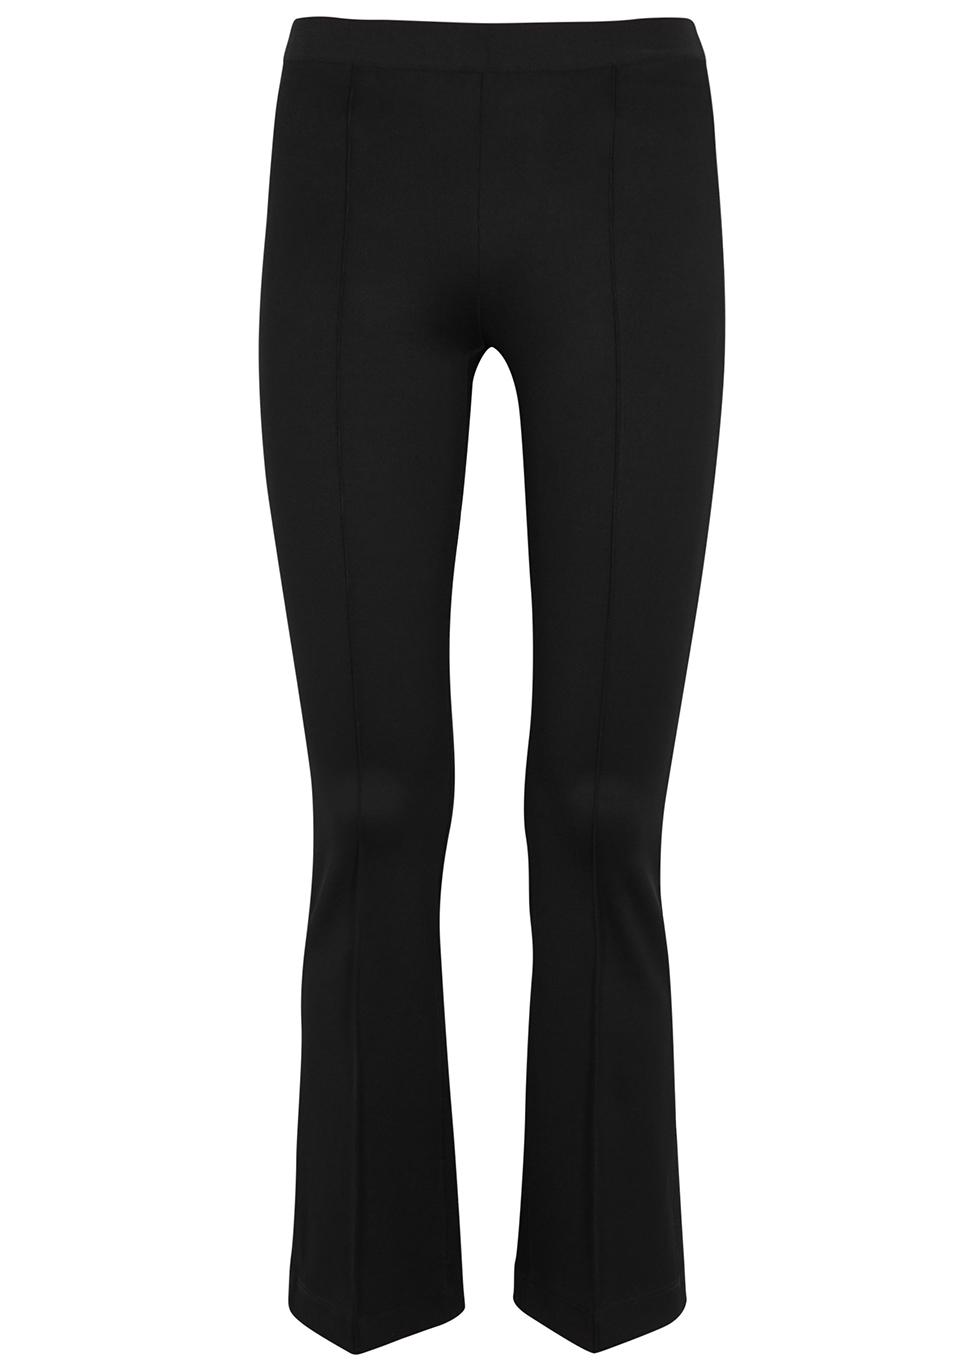 693ae2e138e430 Helmut Lang Dresses, Skirts, Tops, Jackets - Harvey Nichols